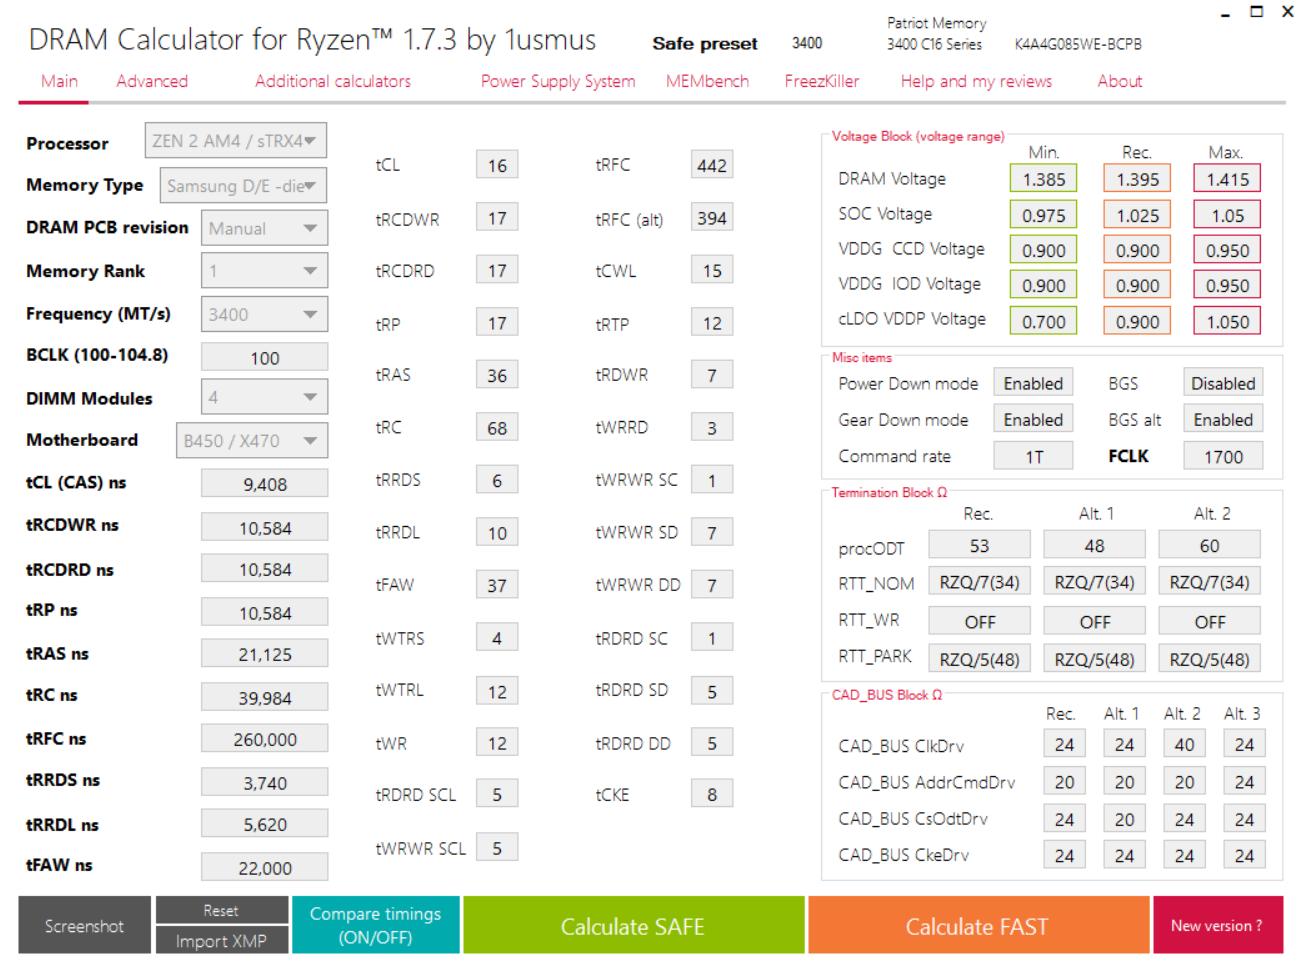 2020-07-04 00_58_52-DRAM Calculator for Ryzen™ 1.7.3 by 1usmus.png